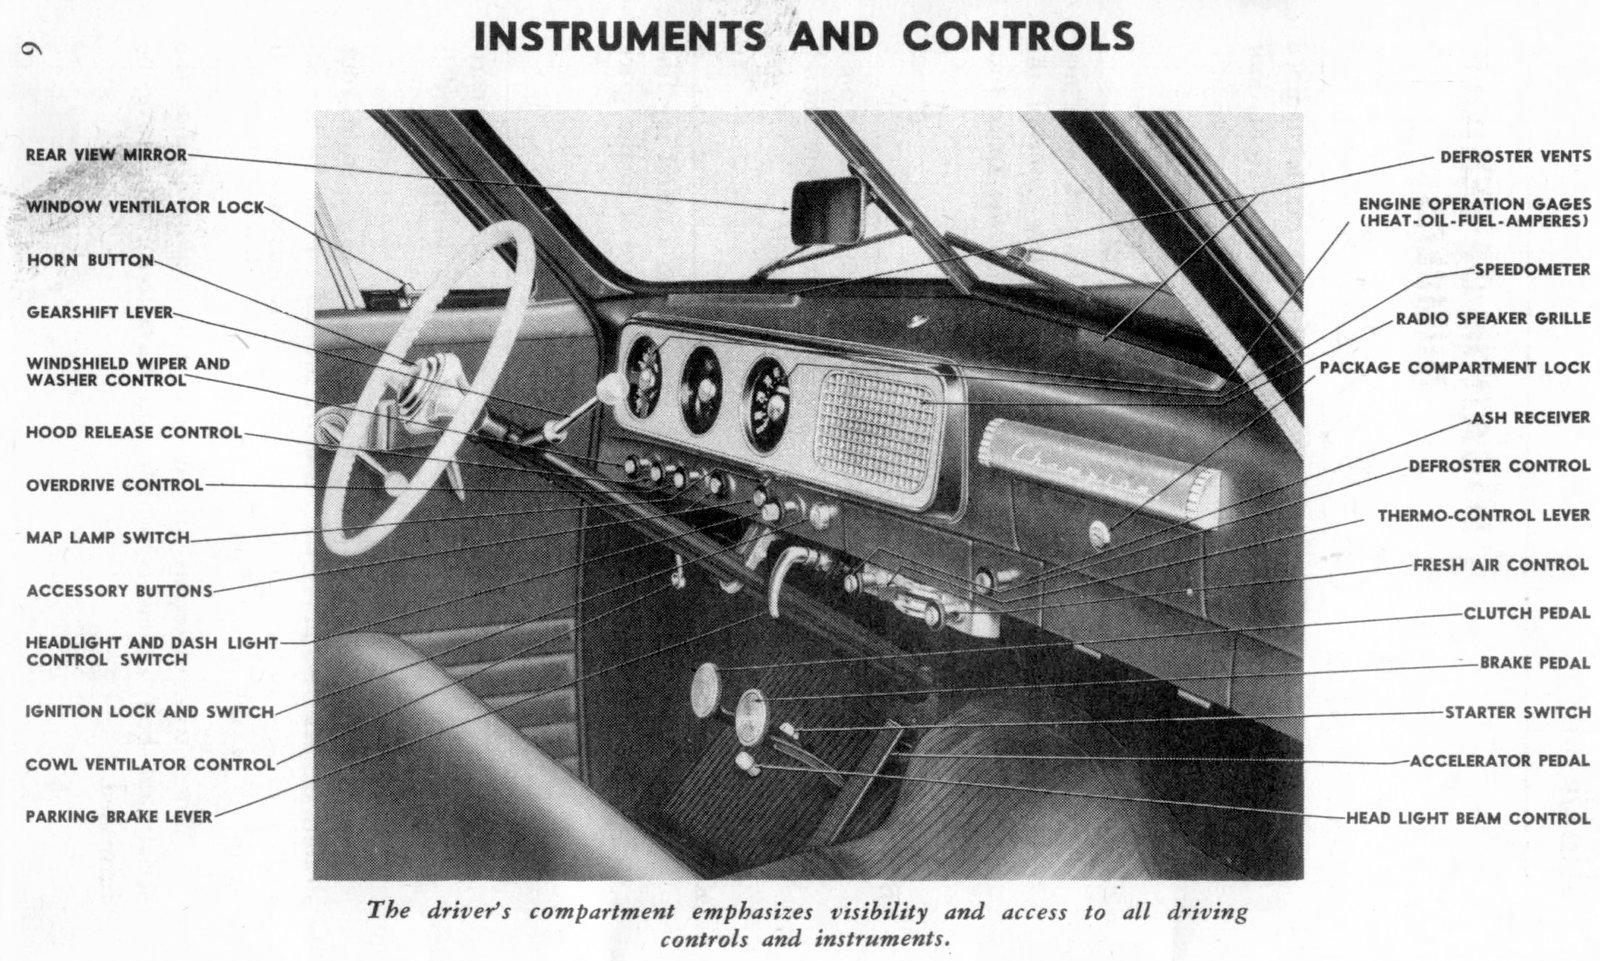 1948 Studebaker Owner's Manual (2)